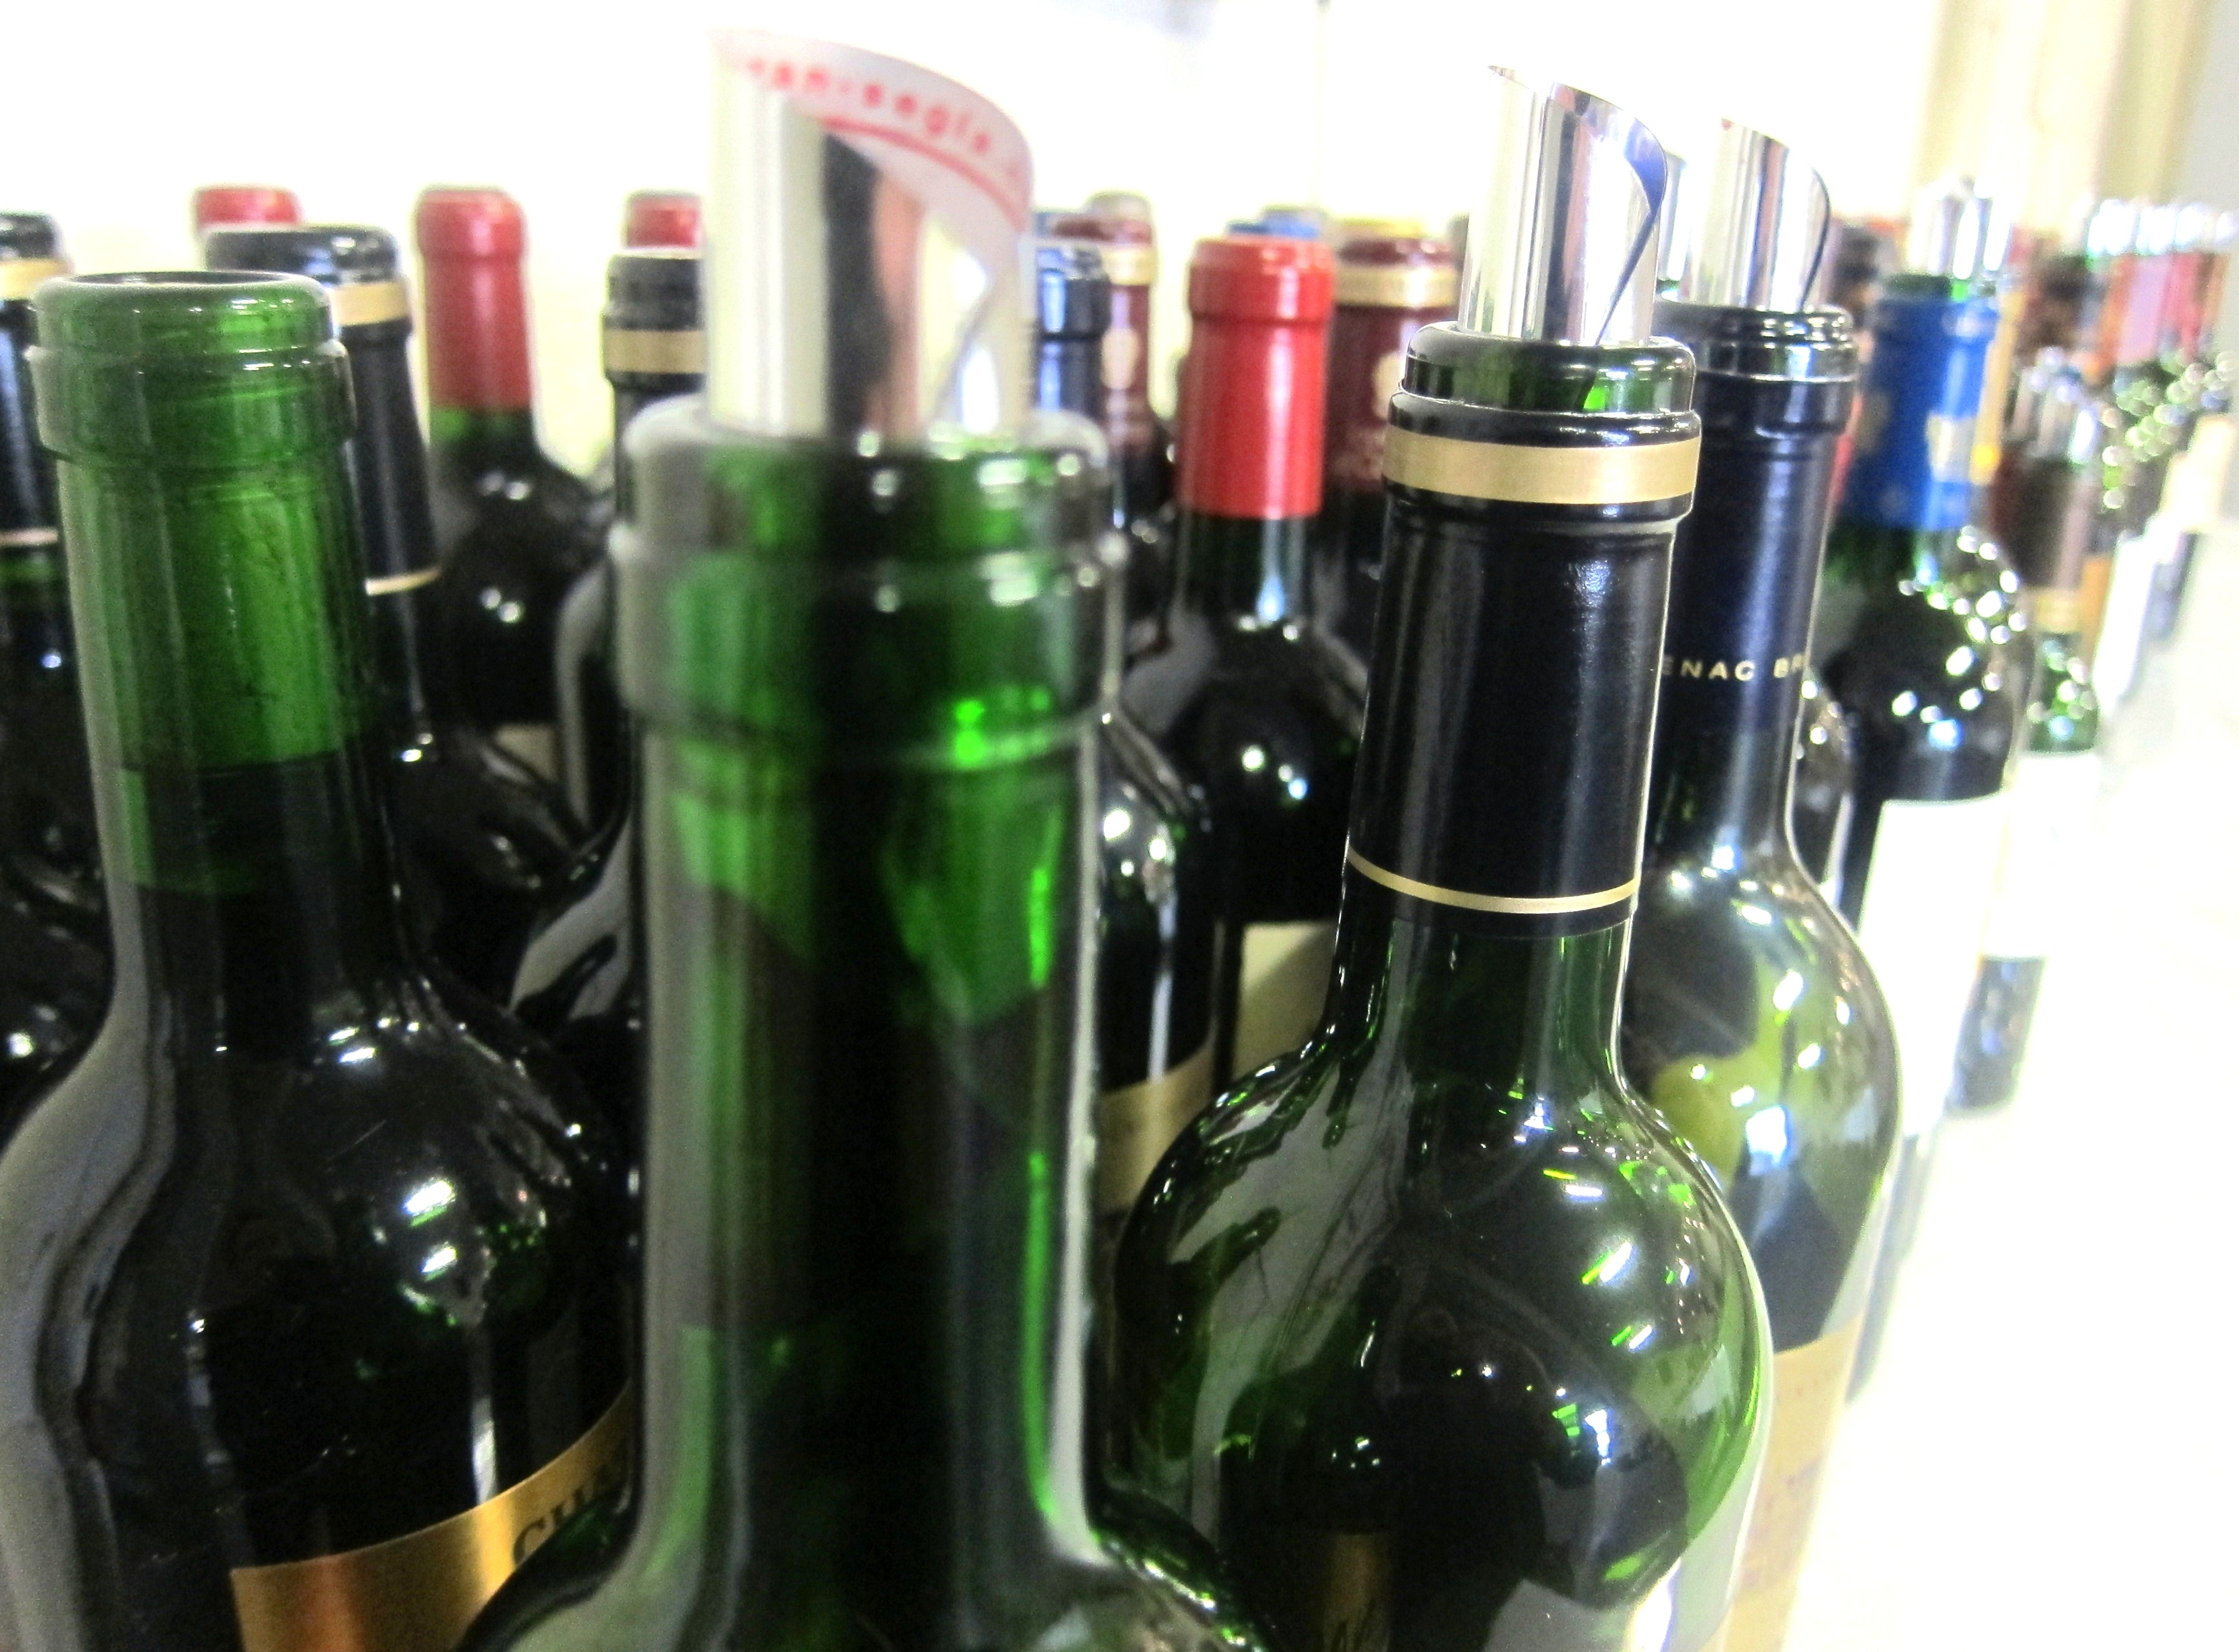 2010 medoc Bordeaux wine